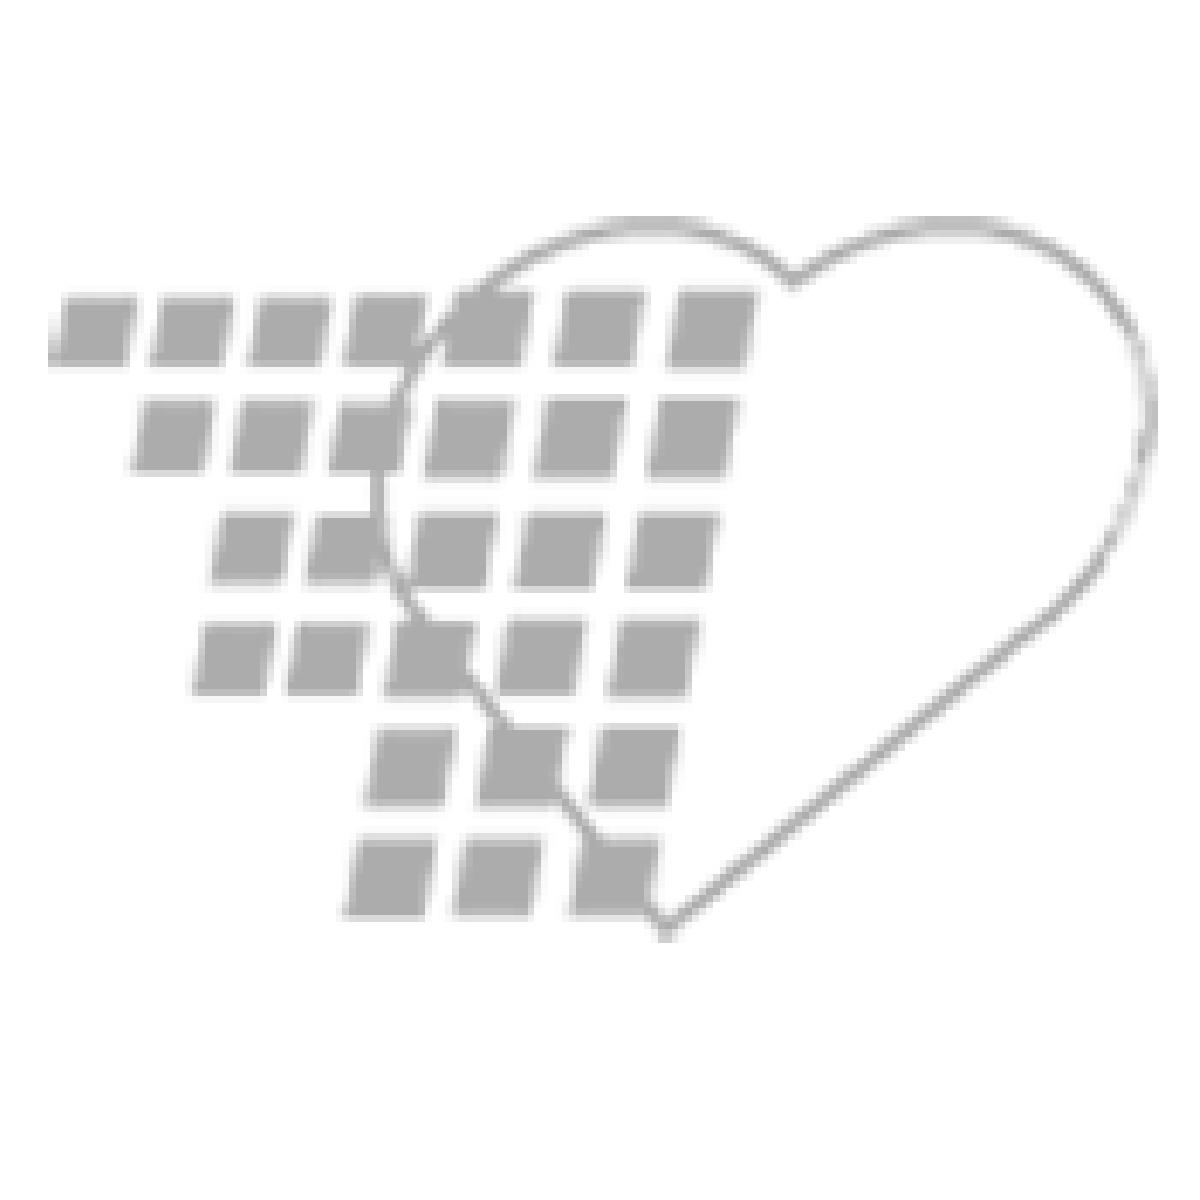 06-82-5164 Monoject™ Sternal-Iliac Aspiration Needle, I-Type - 16 G x 3/16 to 1-7/8